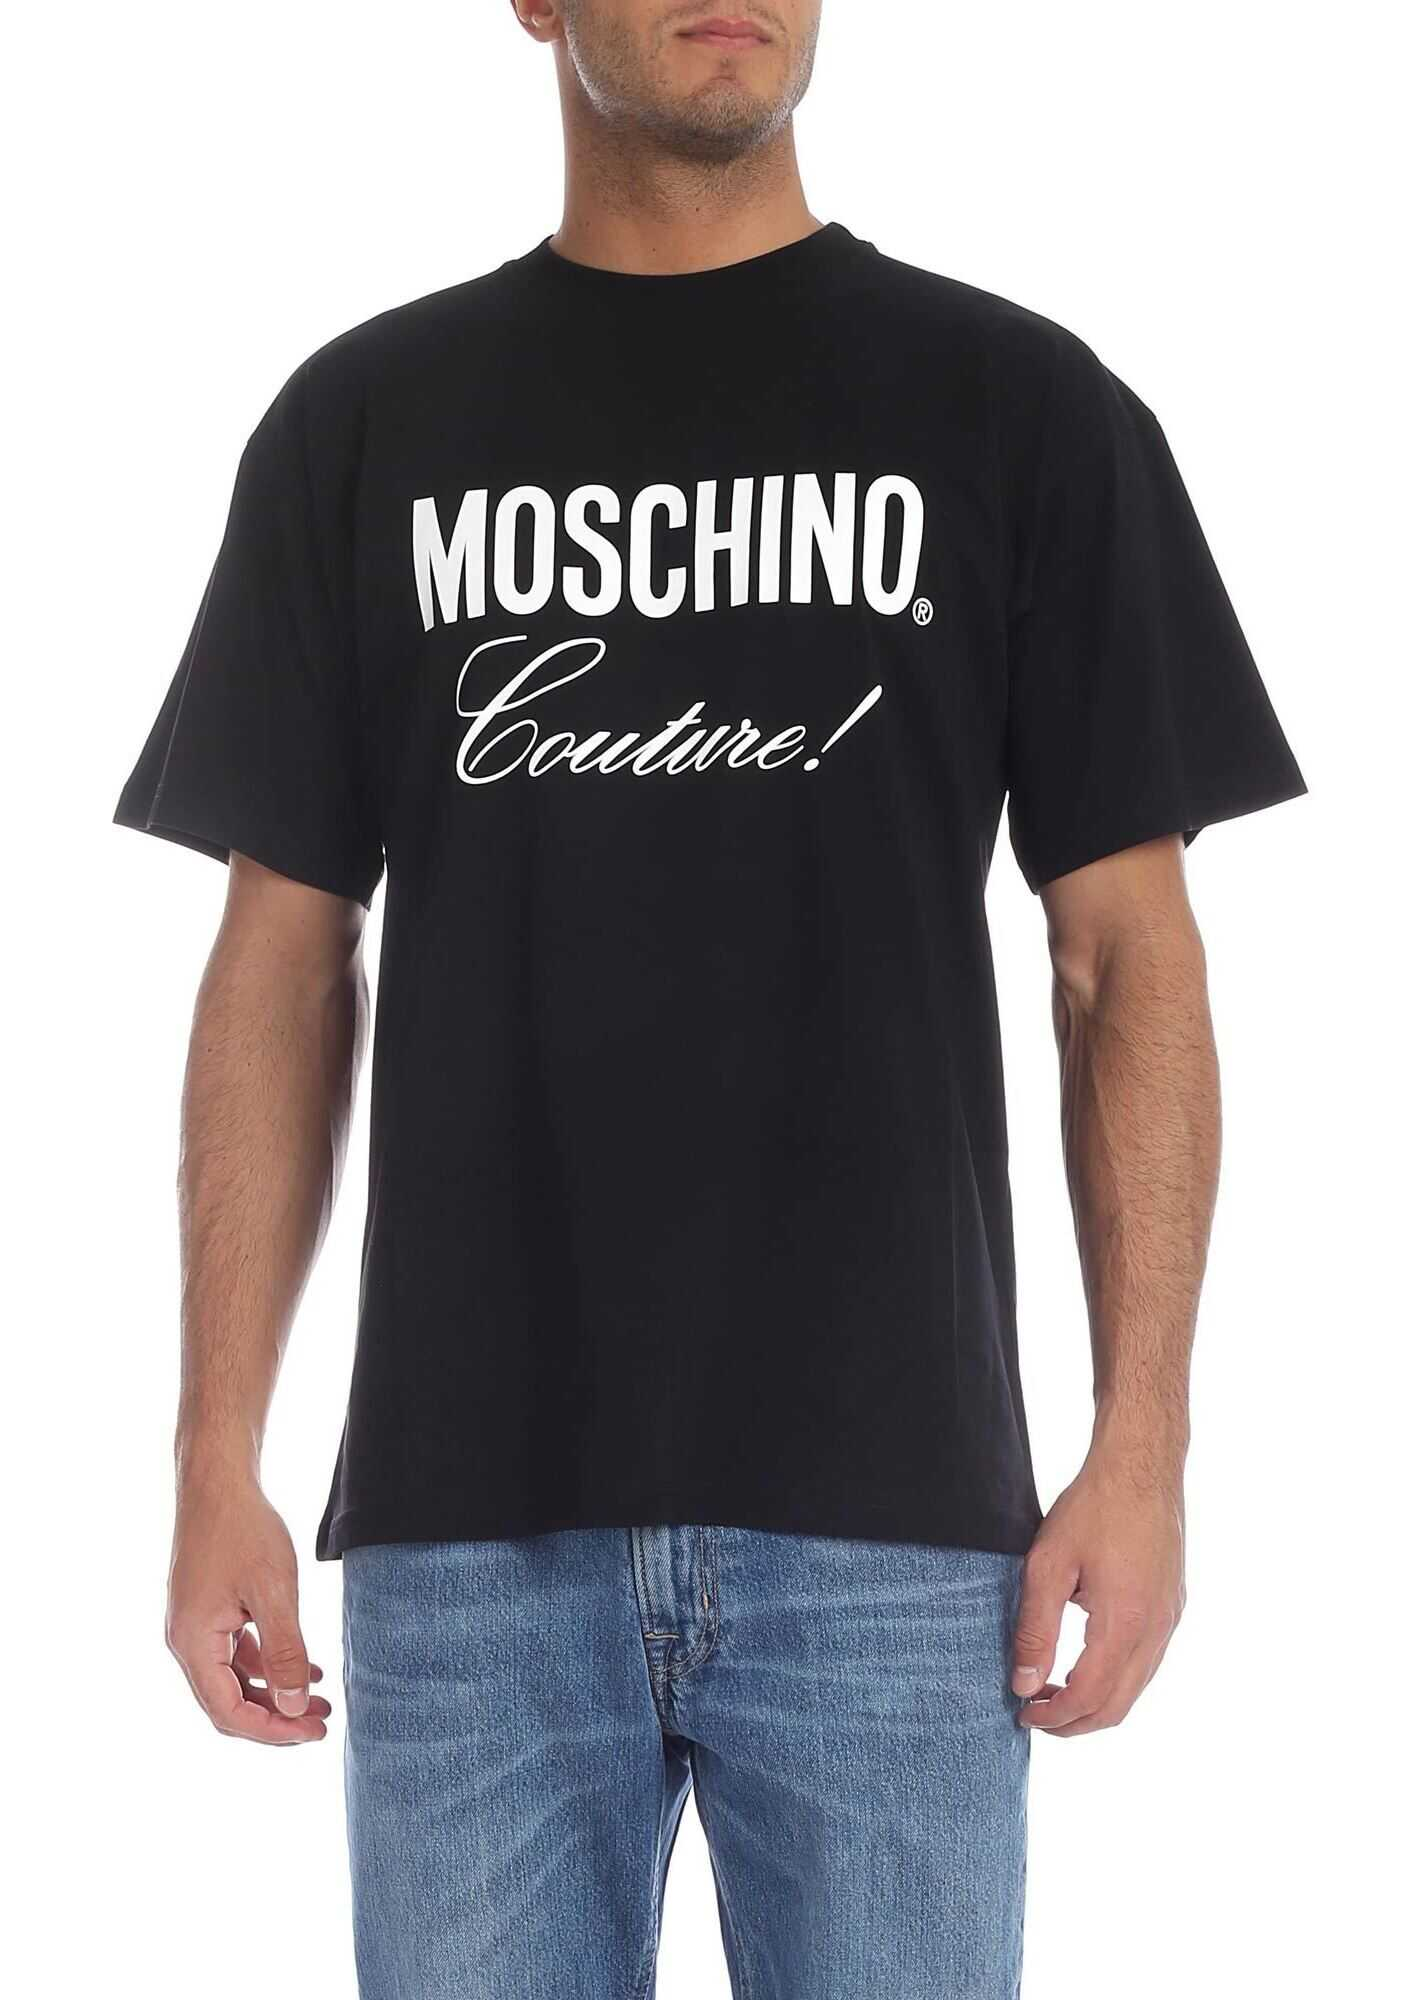 Moschino Moschino Couture T-Shirt In Black Black